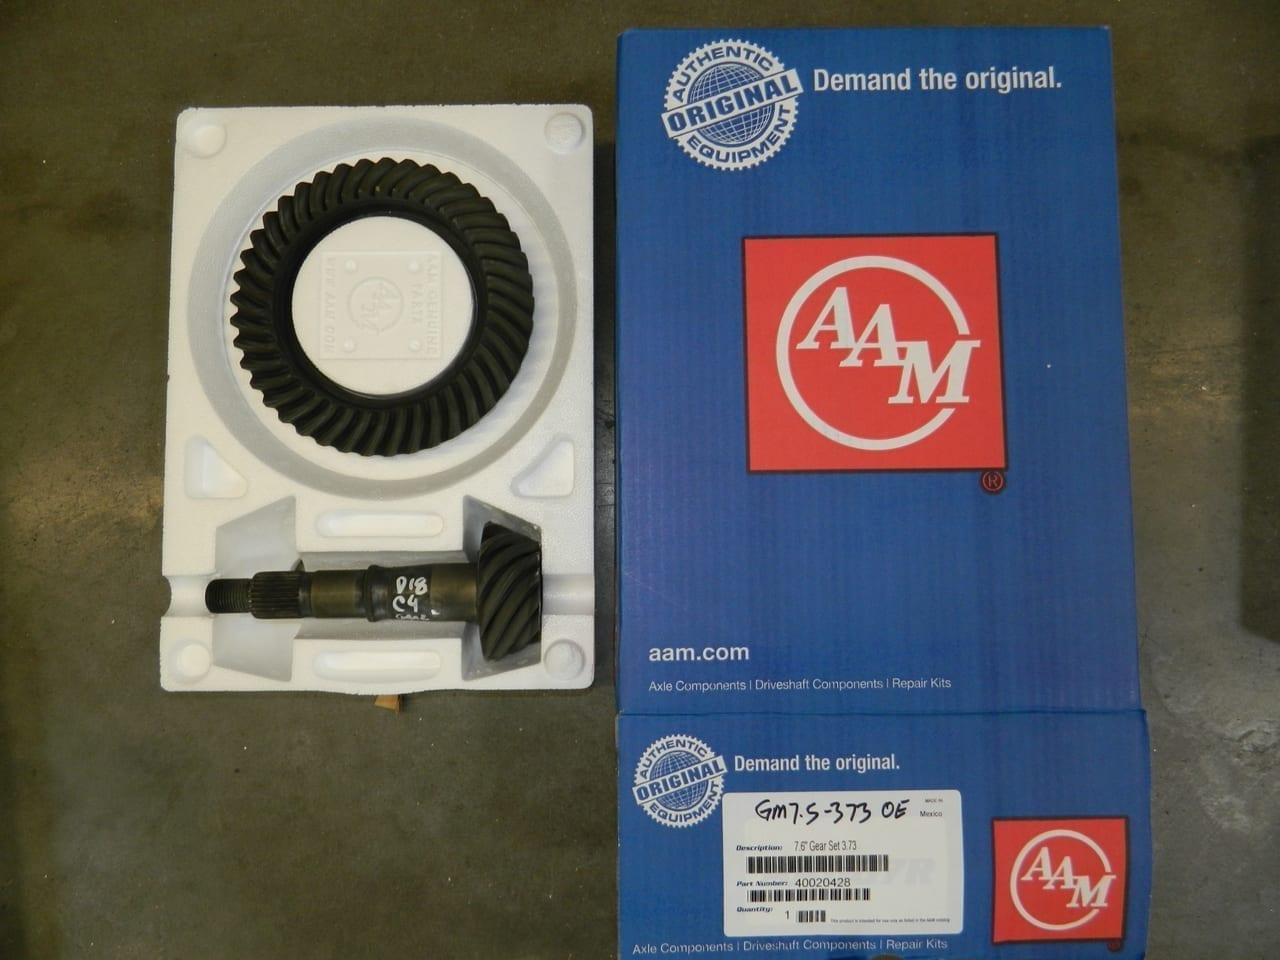 GM7.5-373 OEM AAM Ring & Pinion 10 Bolt Gear Set 7.5/7.6 Chevy S10 Camaro